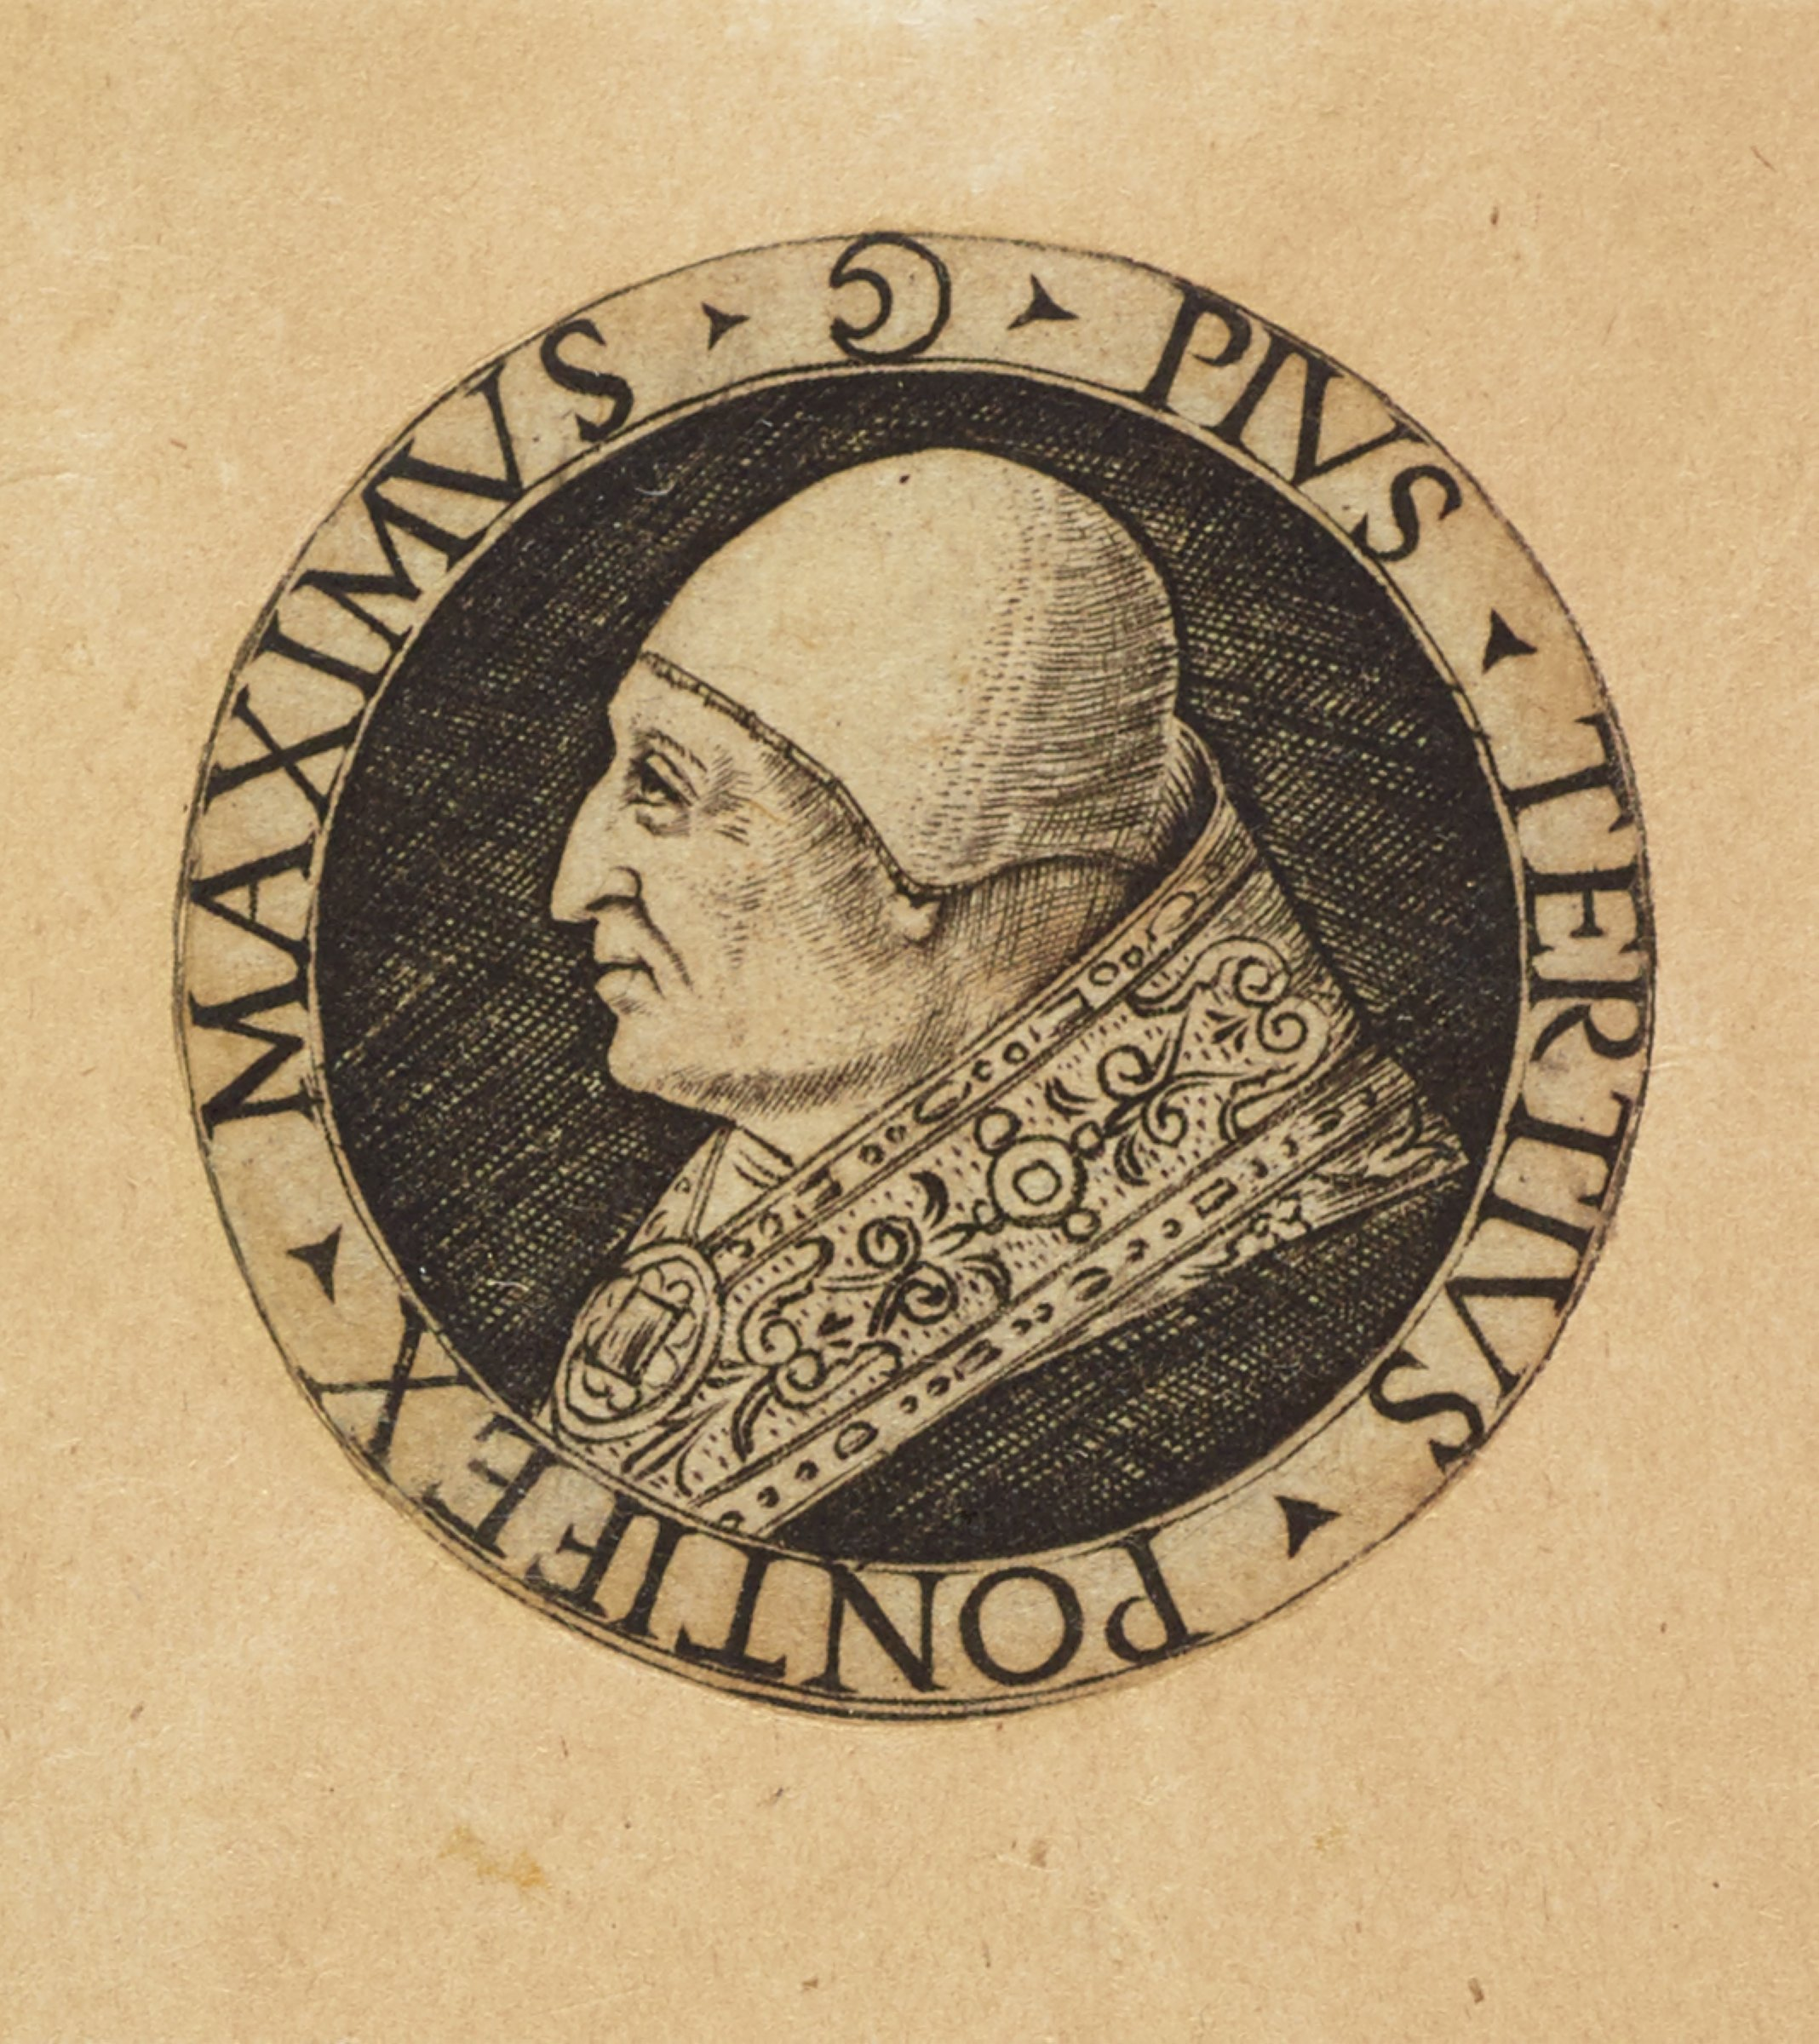 "Bust portrait in profile of Pope Pius III facing left. Surrounding the portrait is inscribed his title and name in Latin, ""Pontifex Maximus- Pius Tertius."""